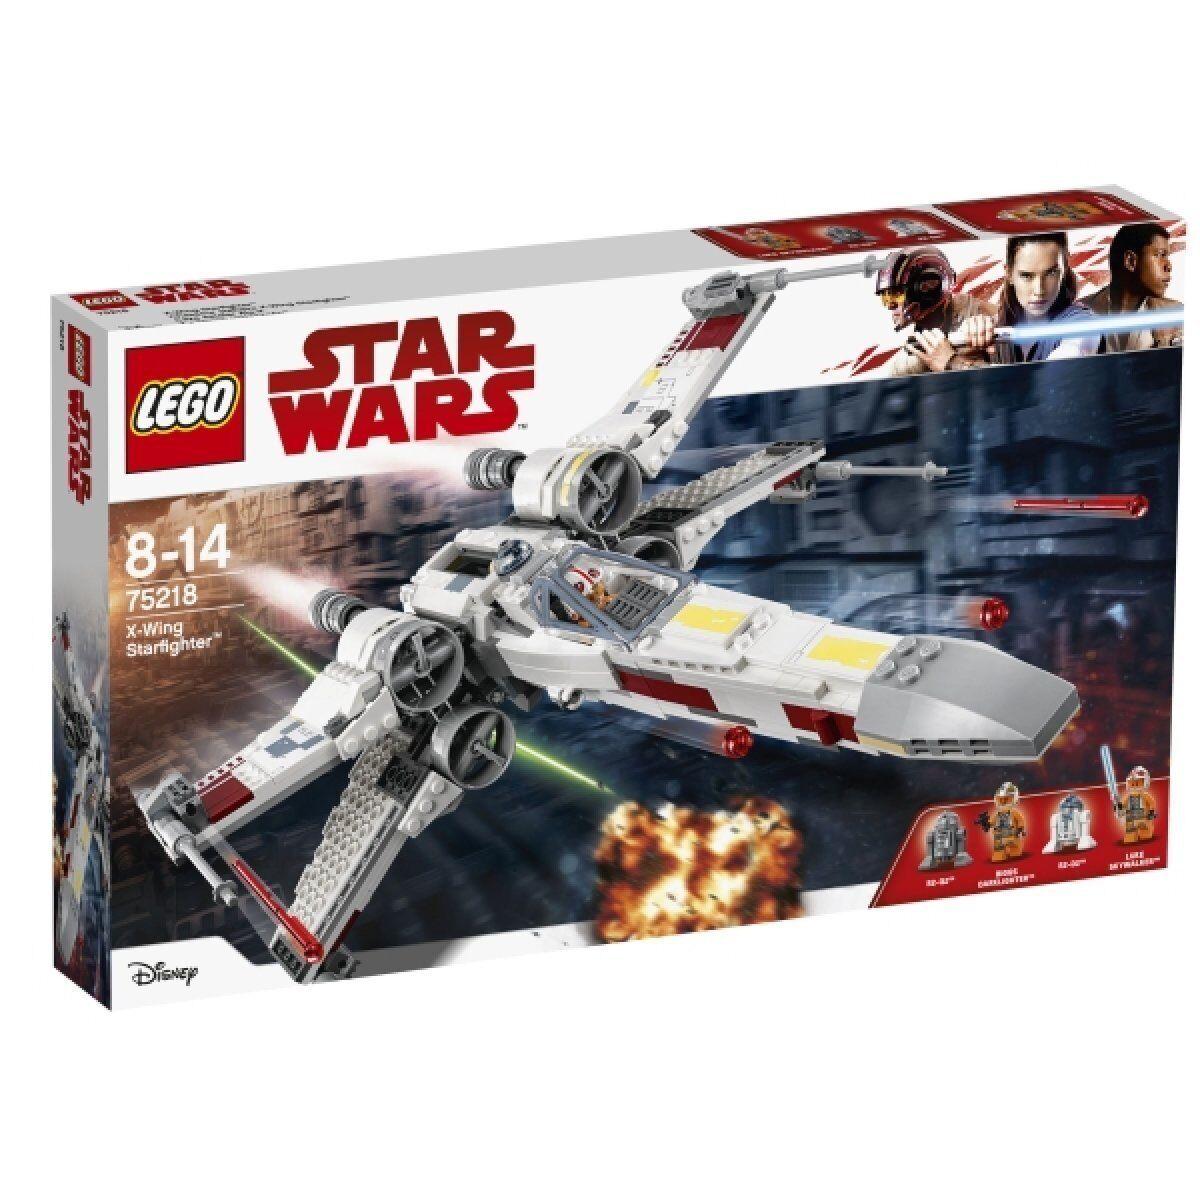 LEGO 75218 Star Wars X-Wing Starfighter NEU OVP